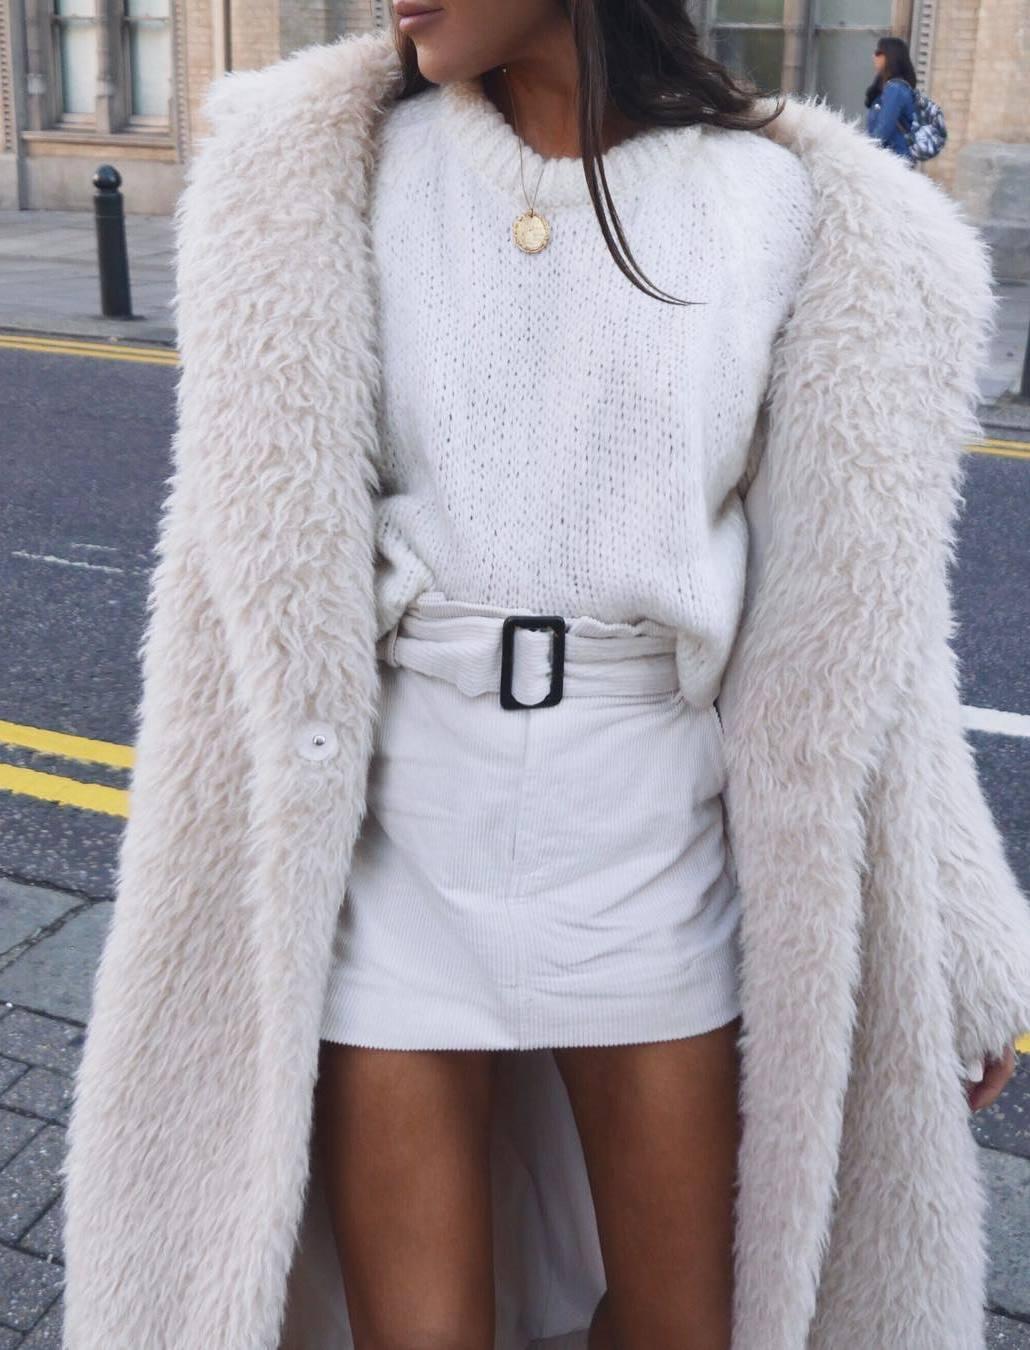 all black eerything / skirt + sweater + fur coat